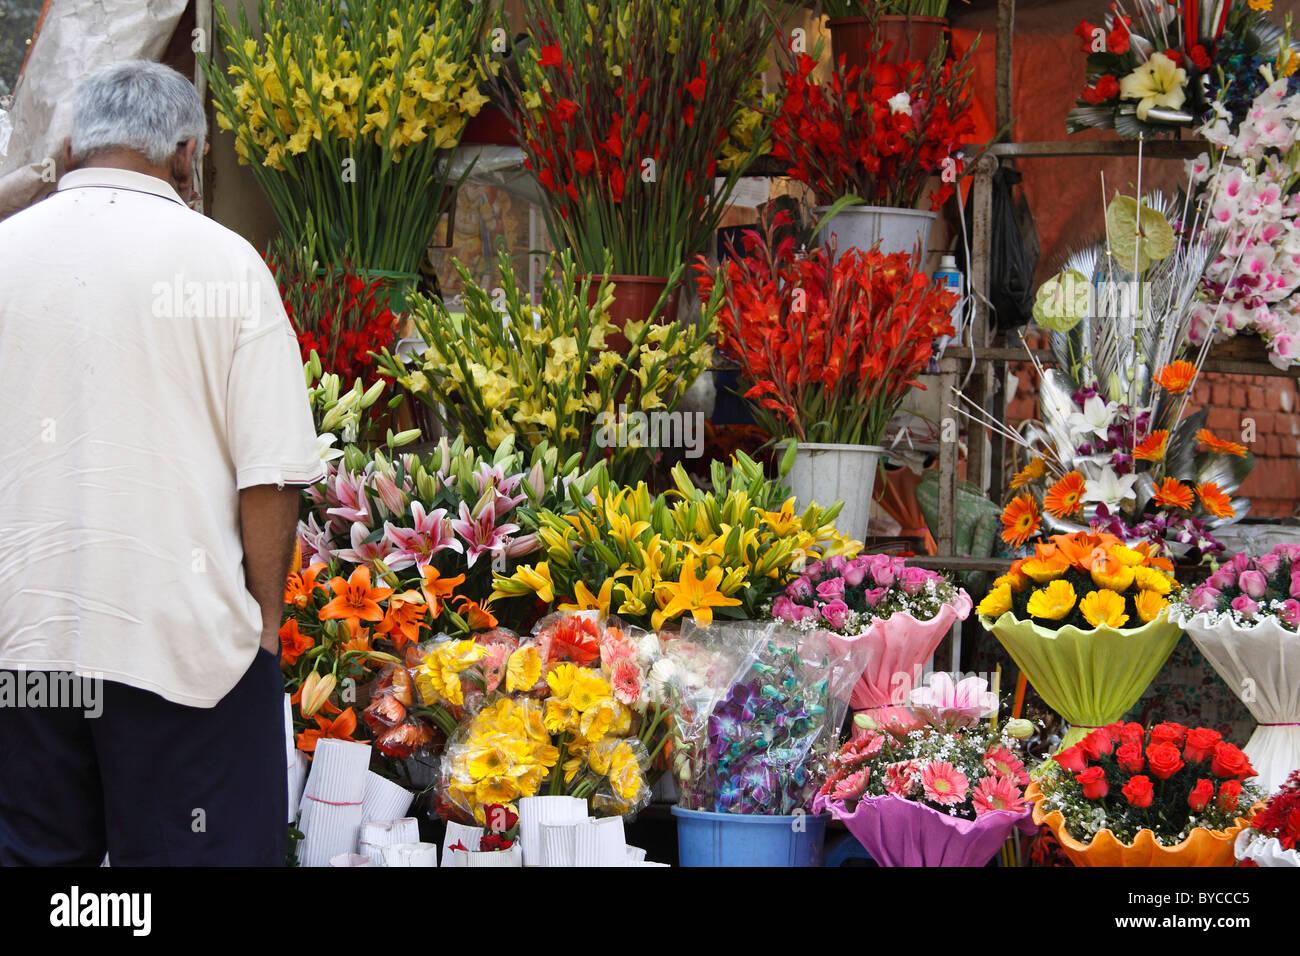 Indian Flower Shop Stock Photos Indian Flower Shop Stock